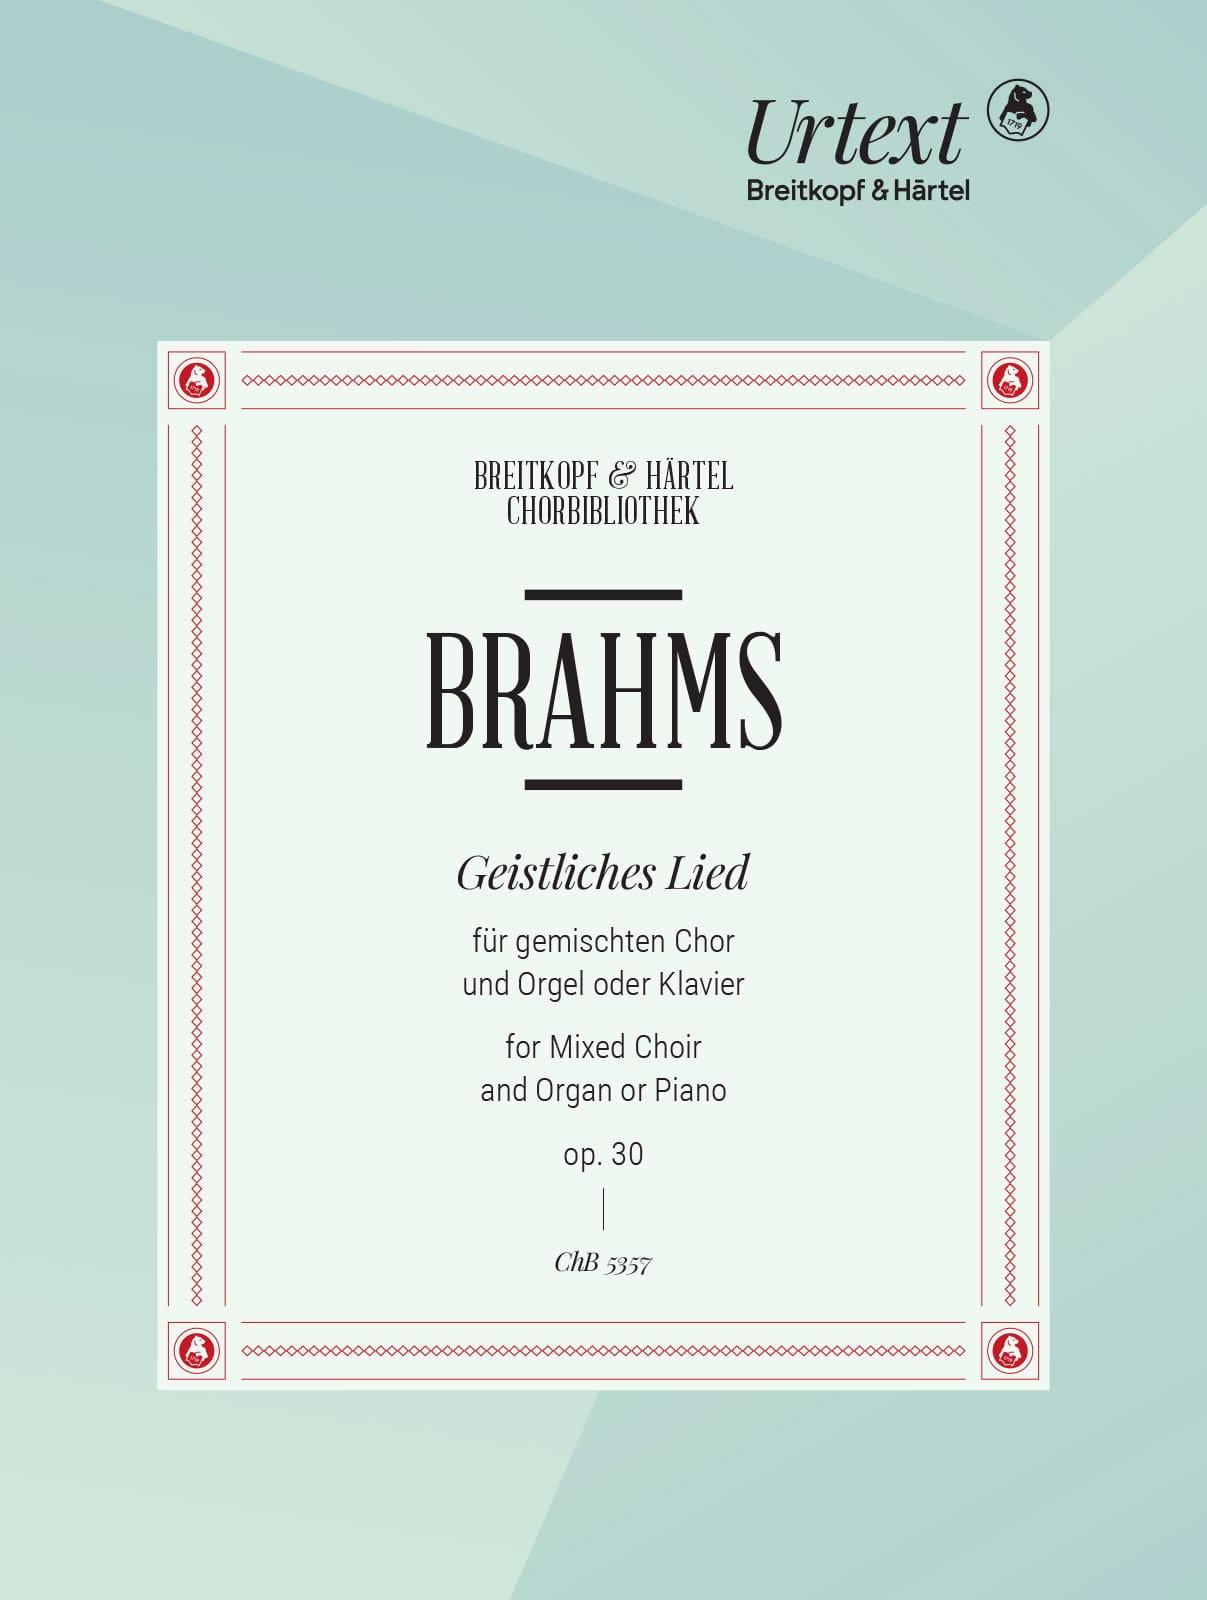 Geistliches Lied Opus 30 - BRAHMS - Partition - laflutedepan.com